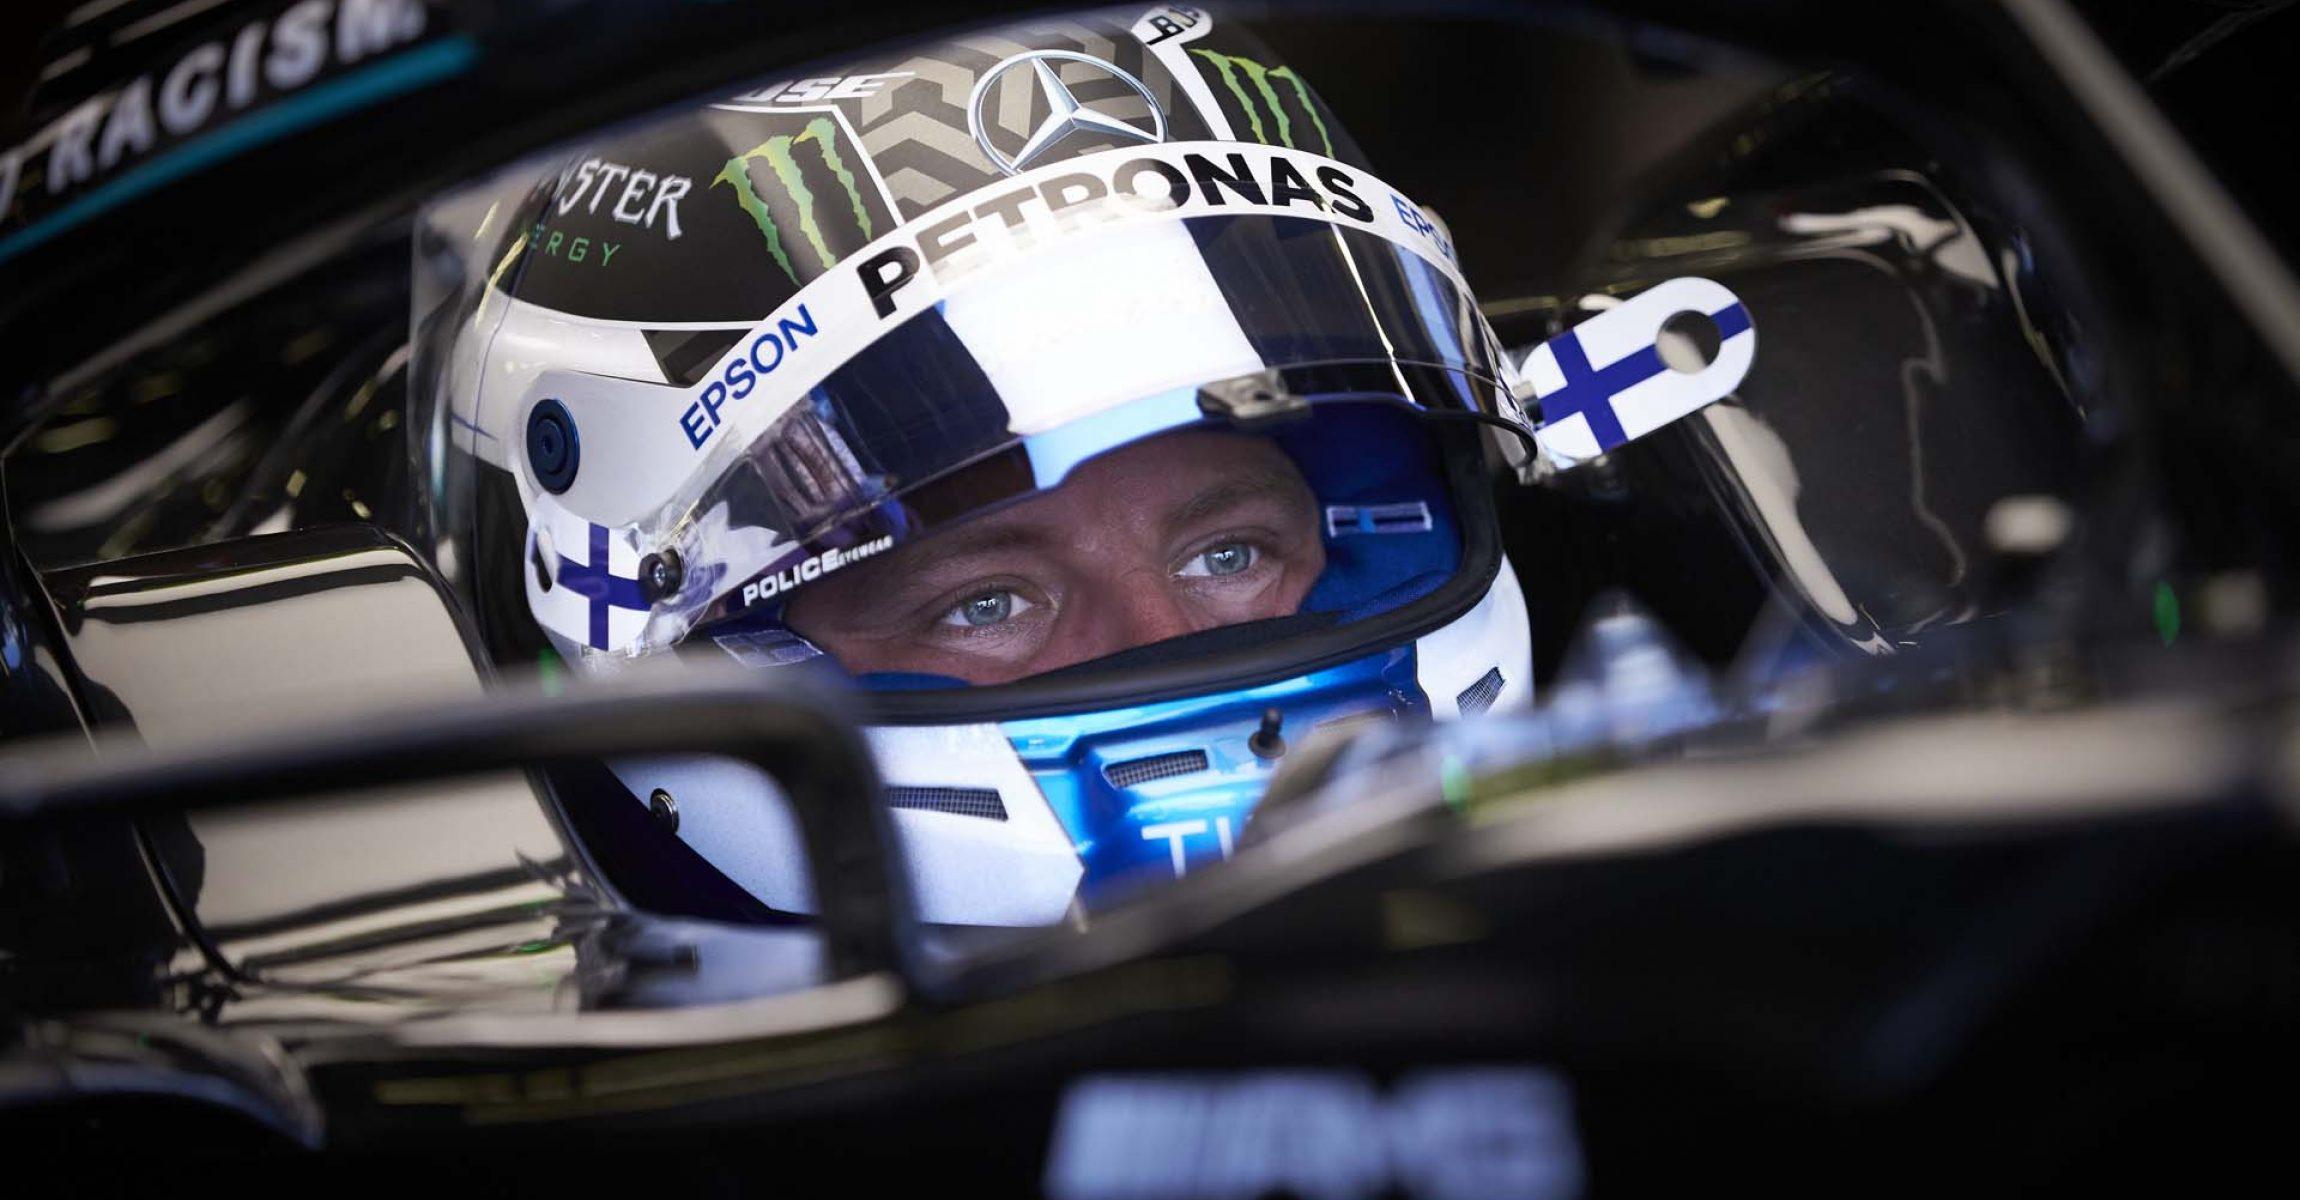 2020 British Grand Prix, Friday- Steve Etherington Valtteri Bottas Mercedes